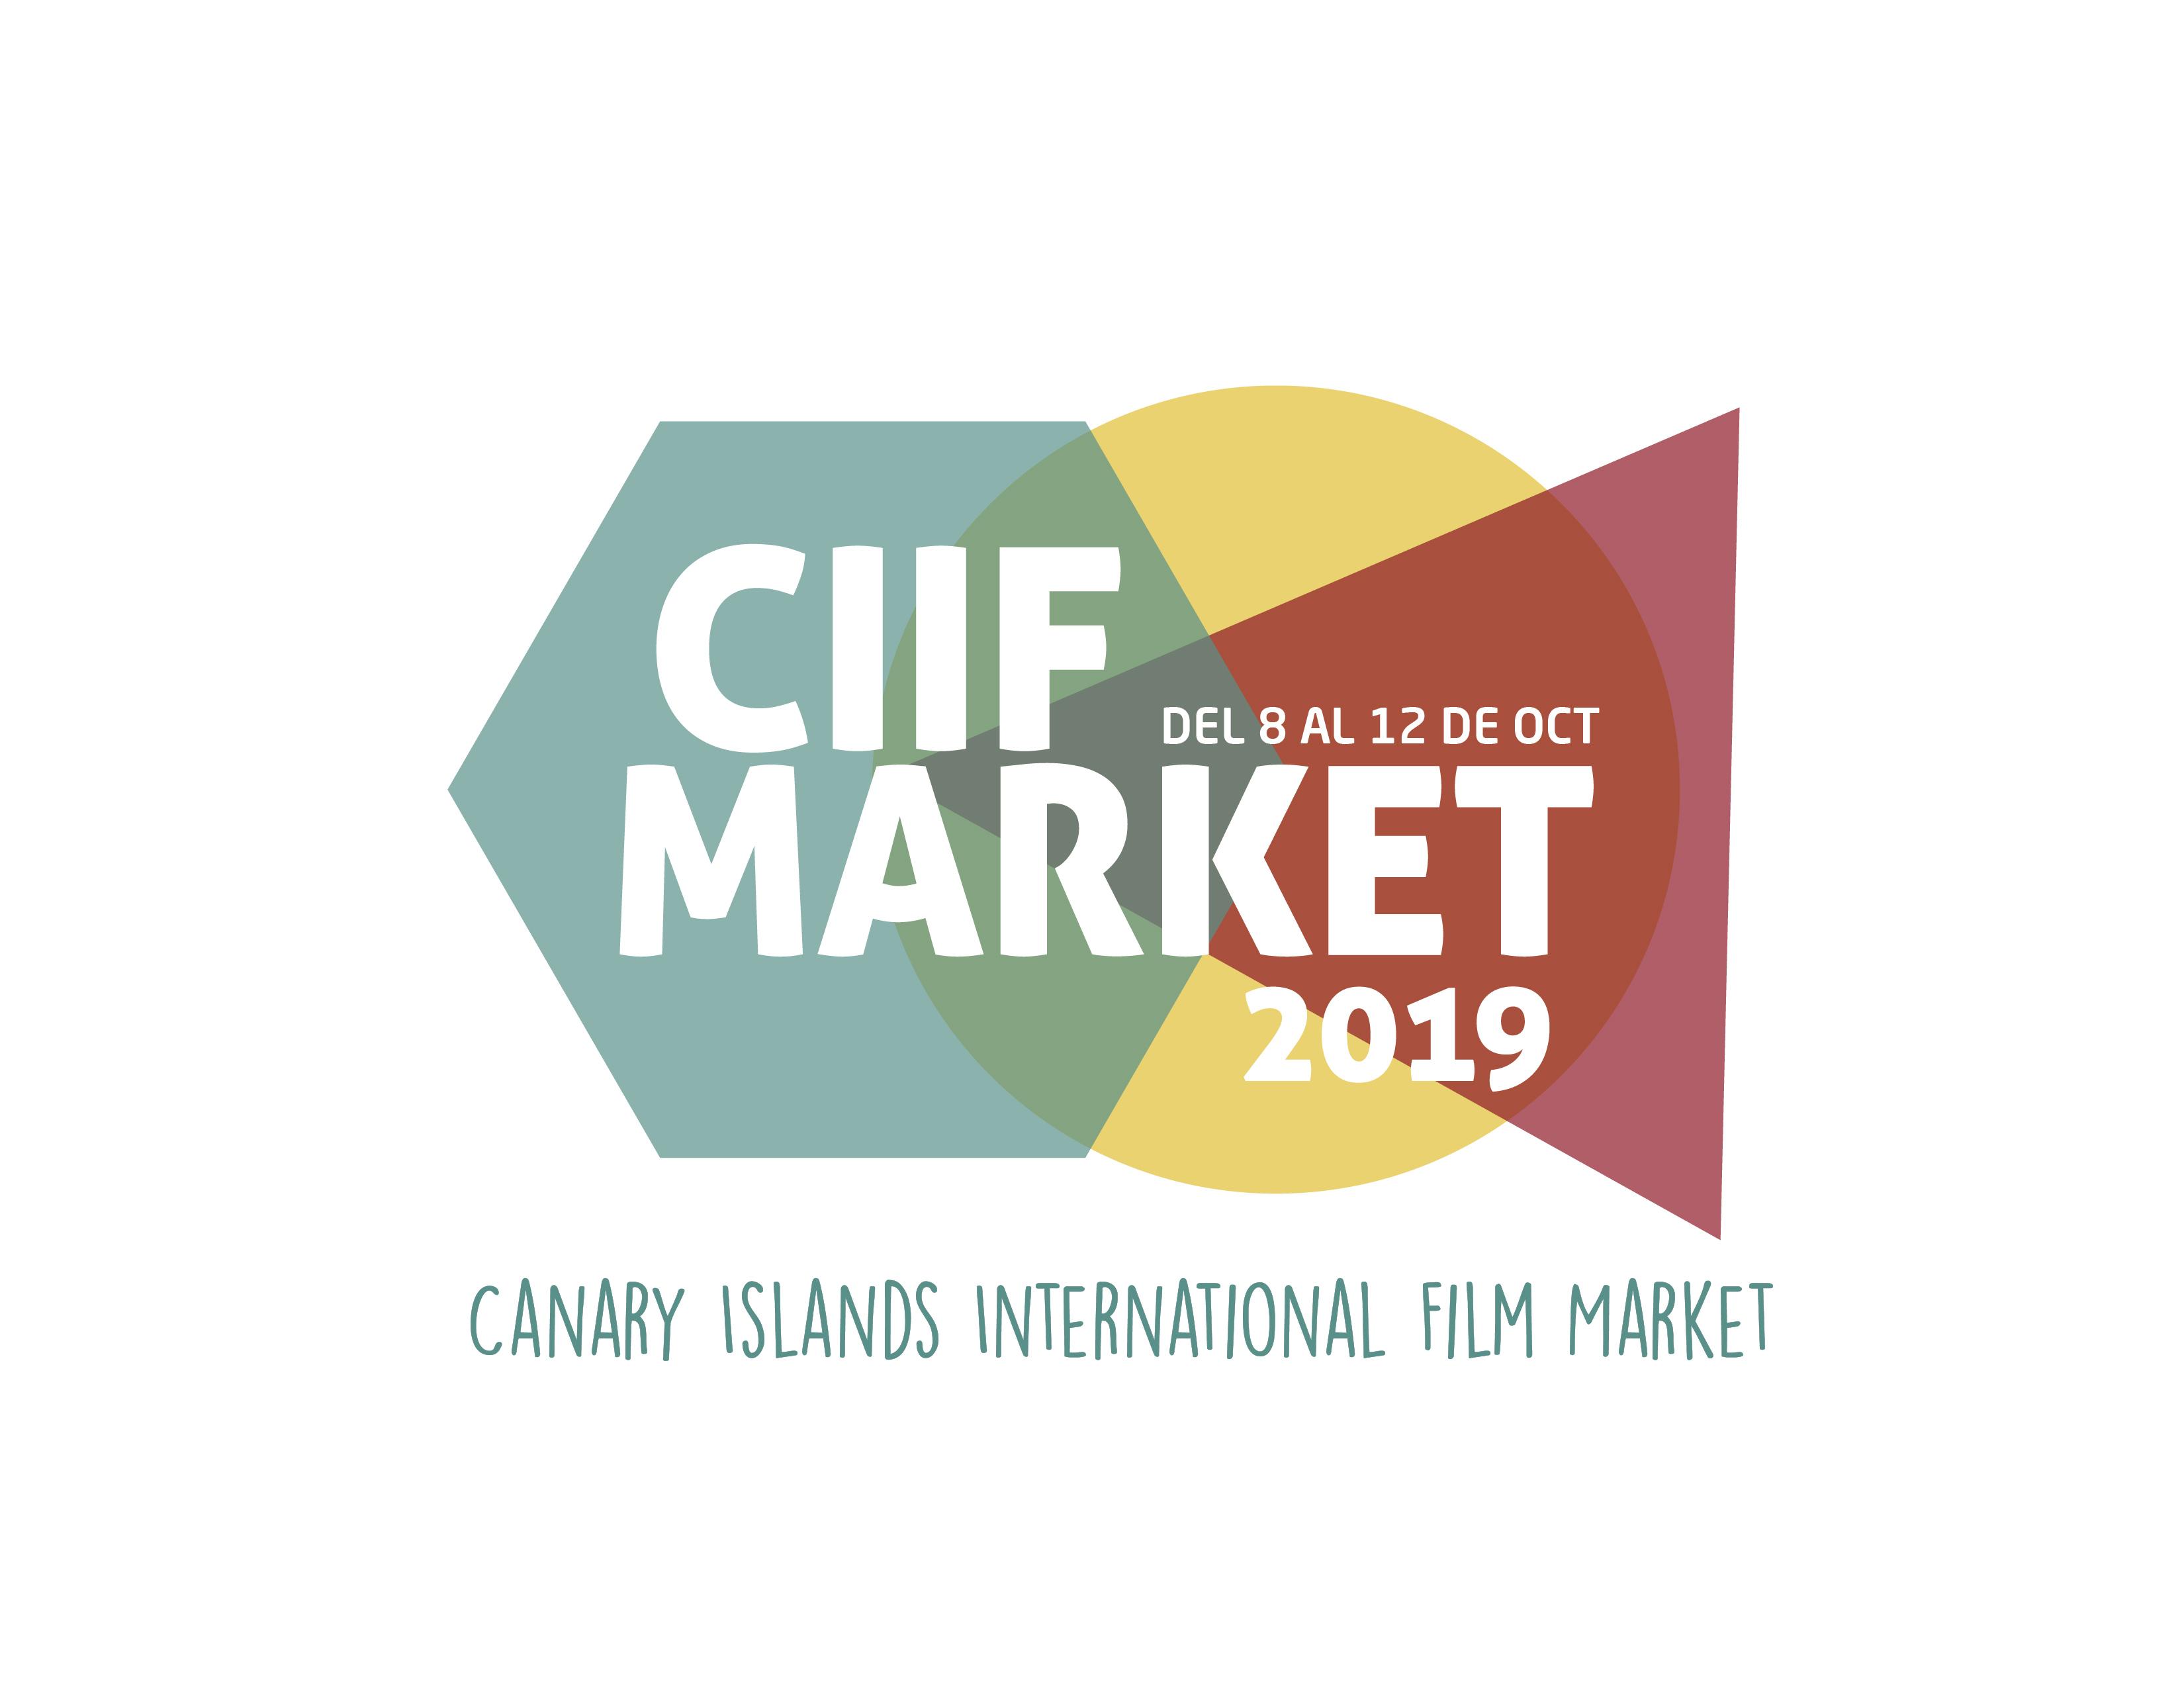 Canary Islands International Film Market